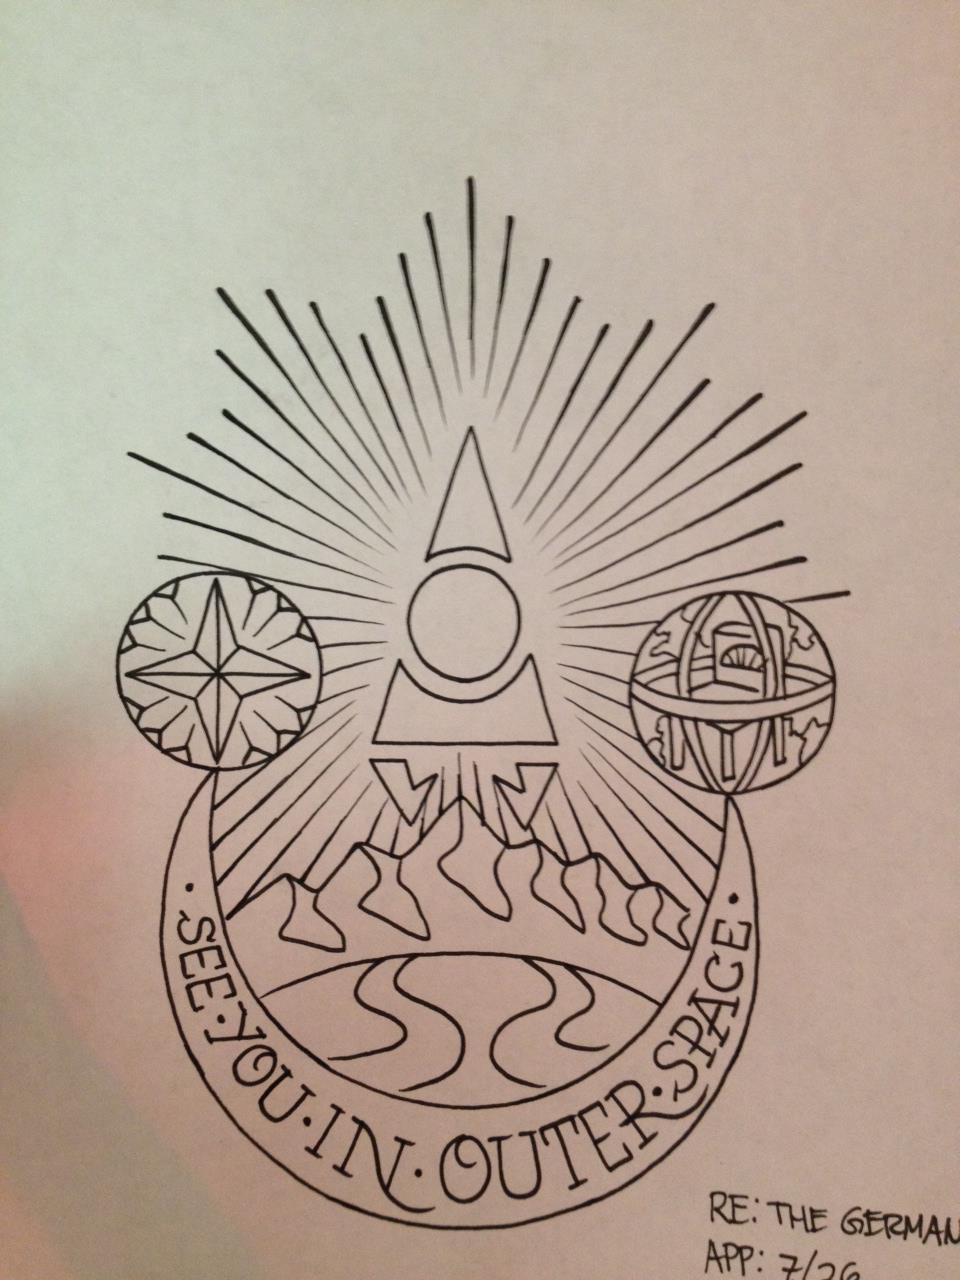 [News] Aperçu de leur tatouage-jumeau - Page 4 867620